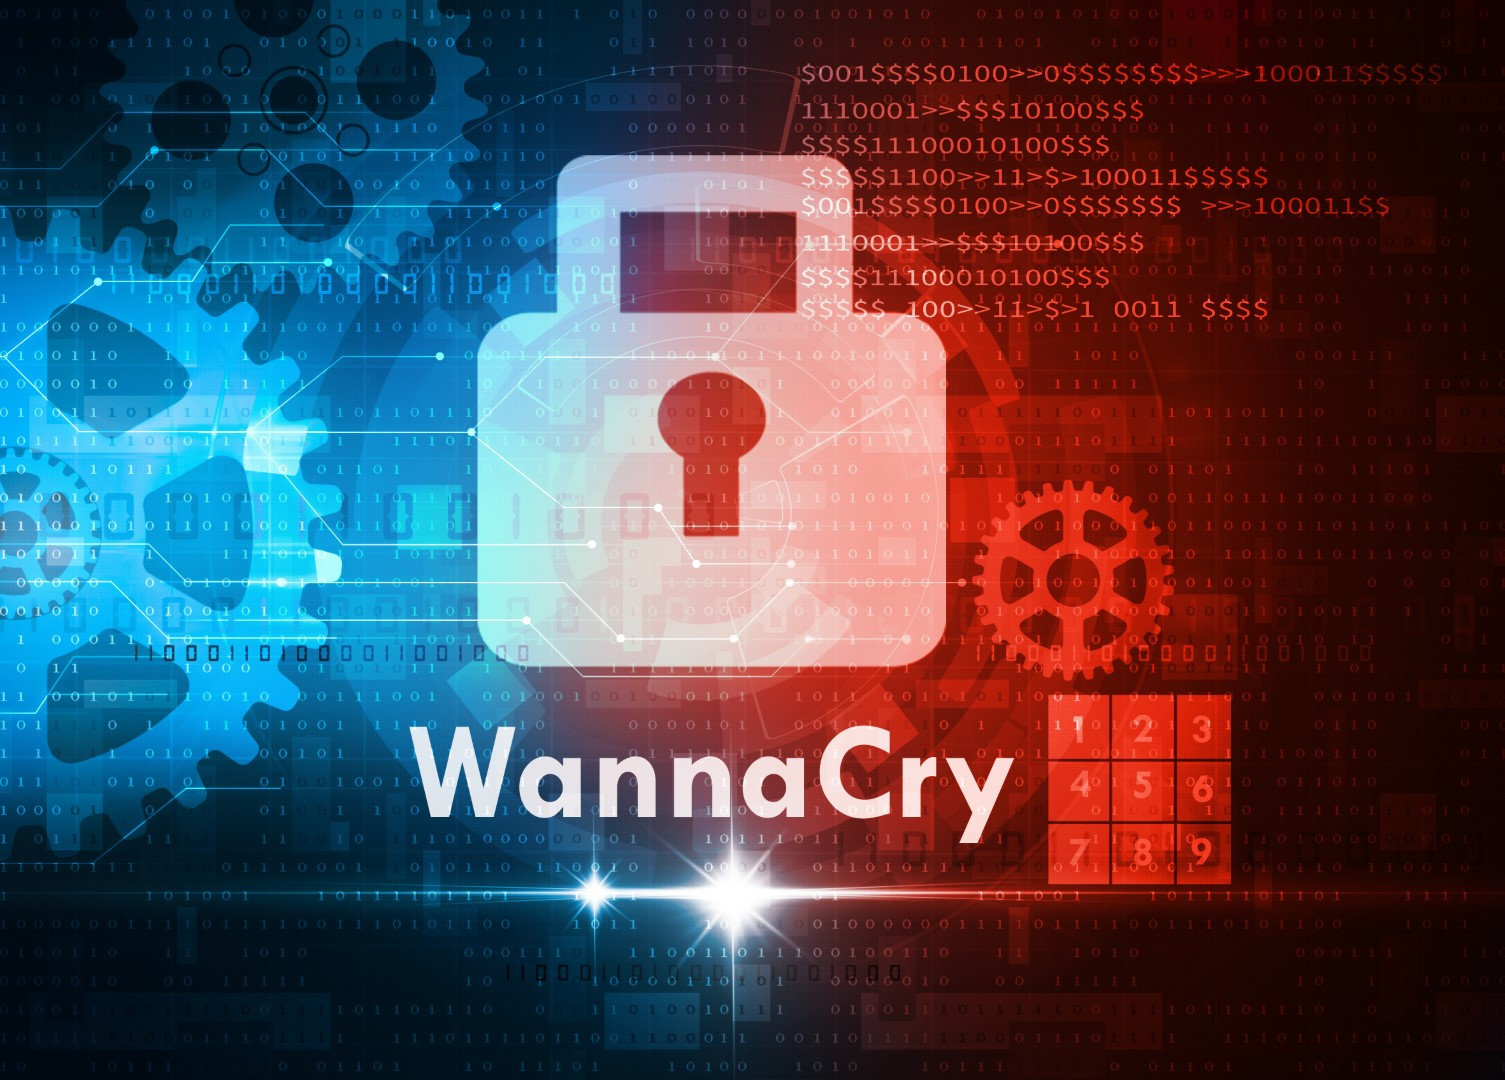 Cyberattaques-Ransomware-WannaCry